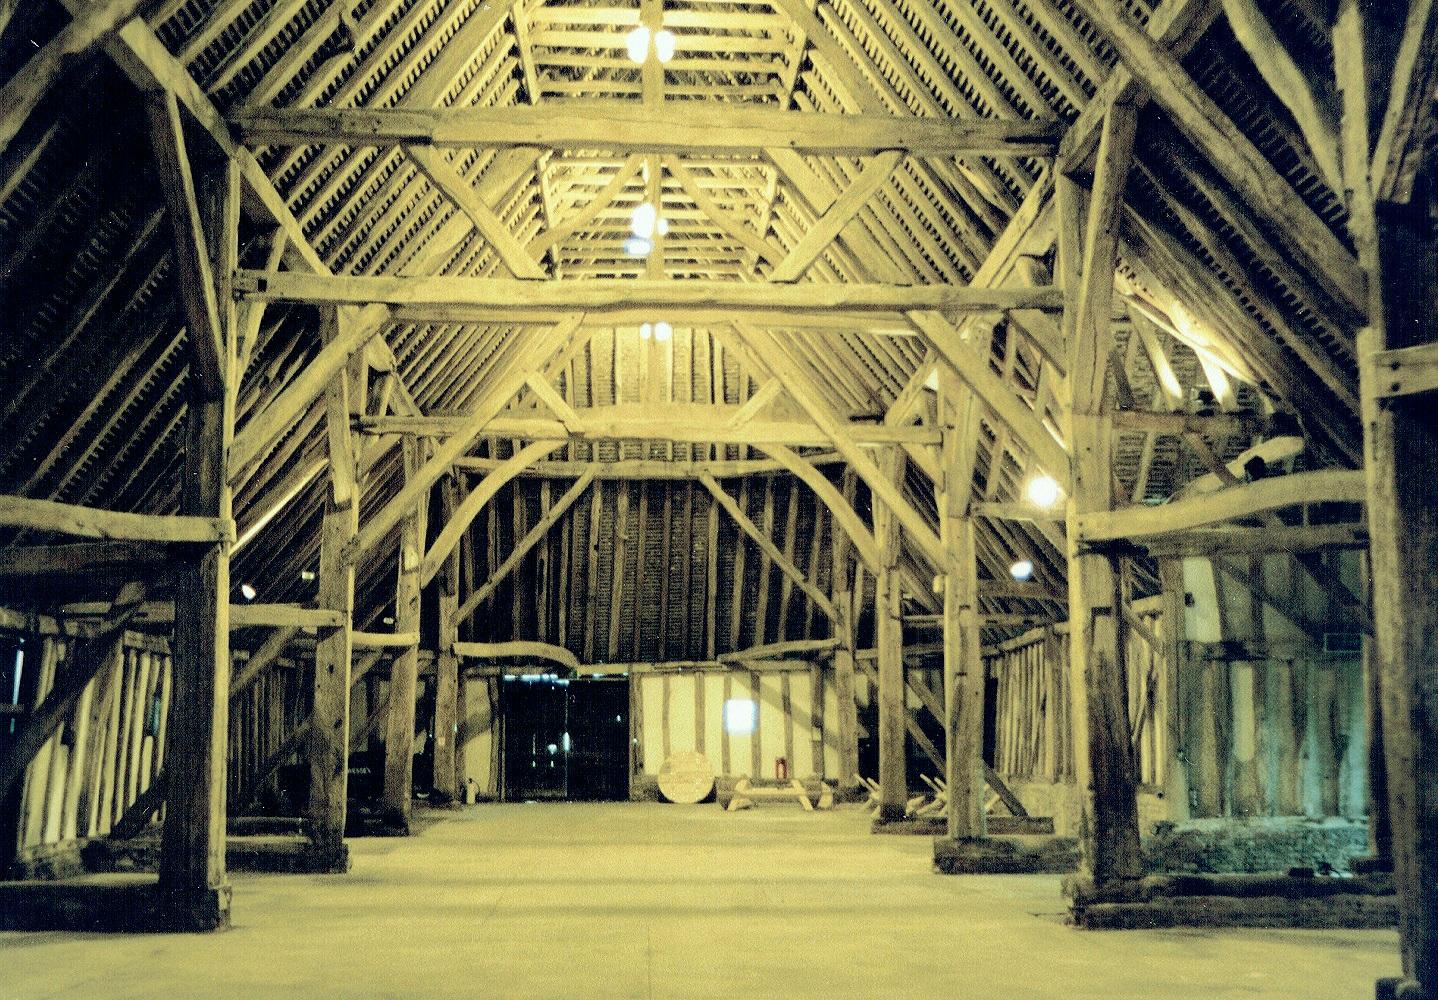 Cressing Temple wheat barn truss